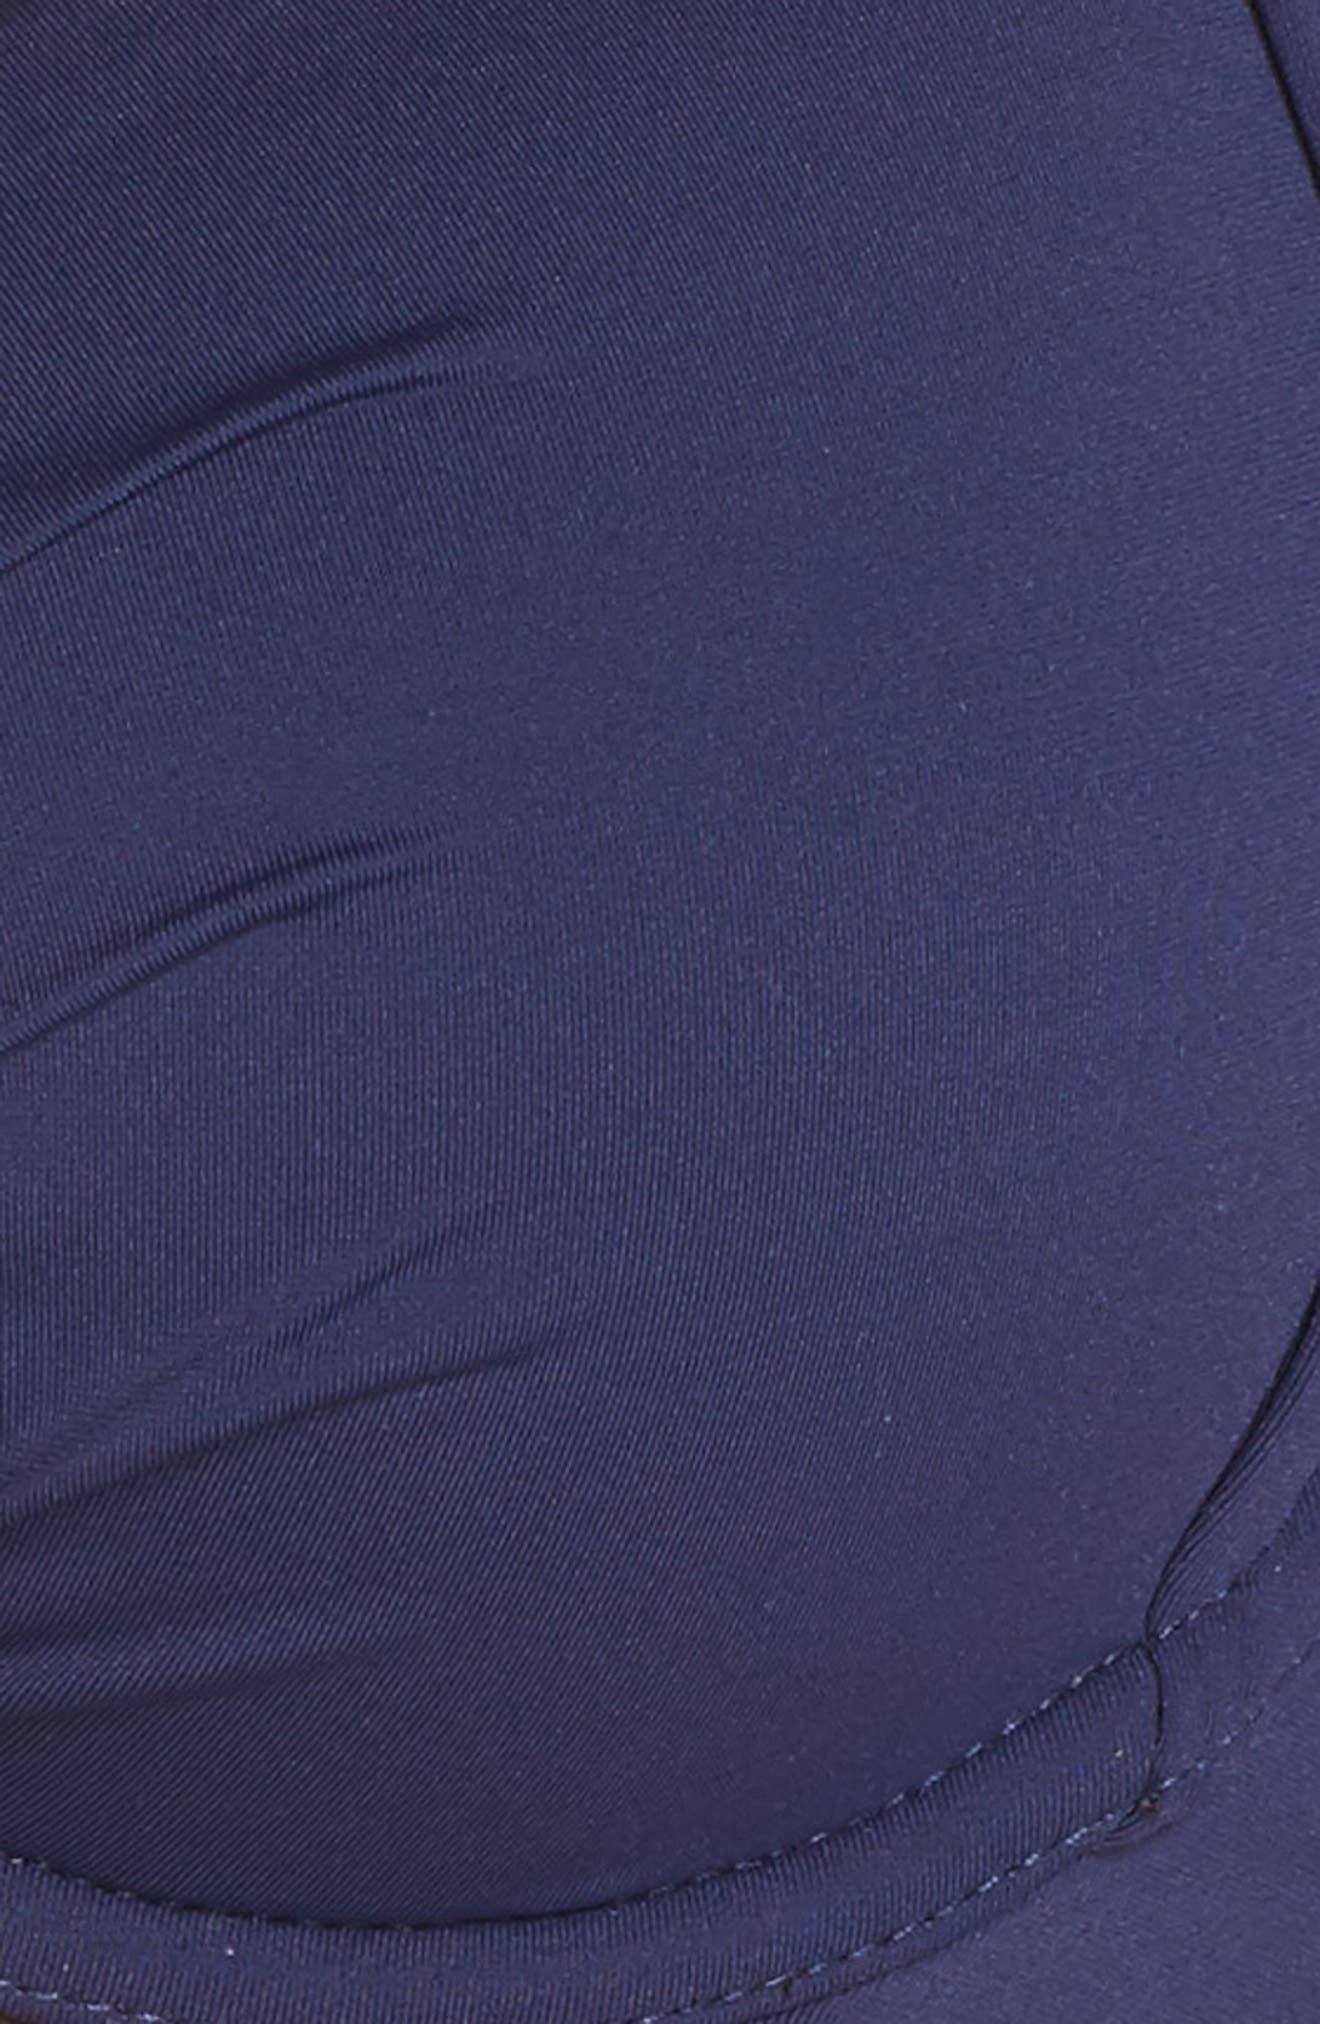 Underwire Halter Bikini Top,                             Alternate thumbnail 5, color,                             MARE NAVY